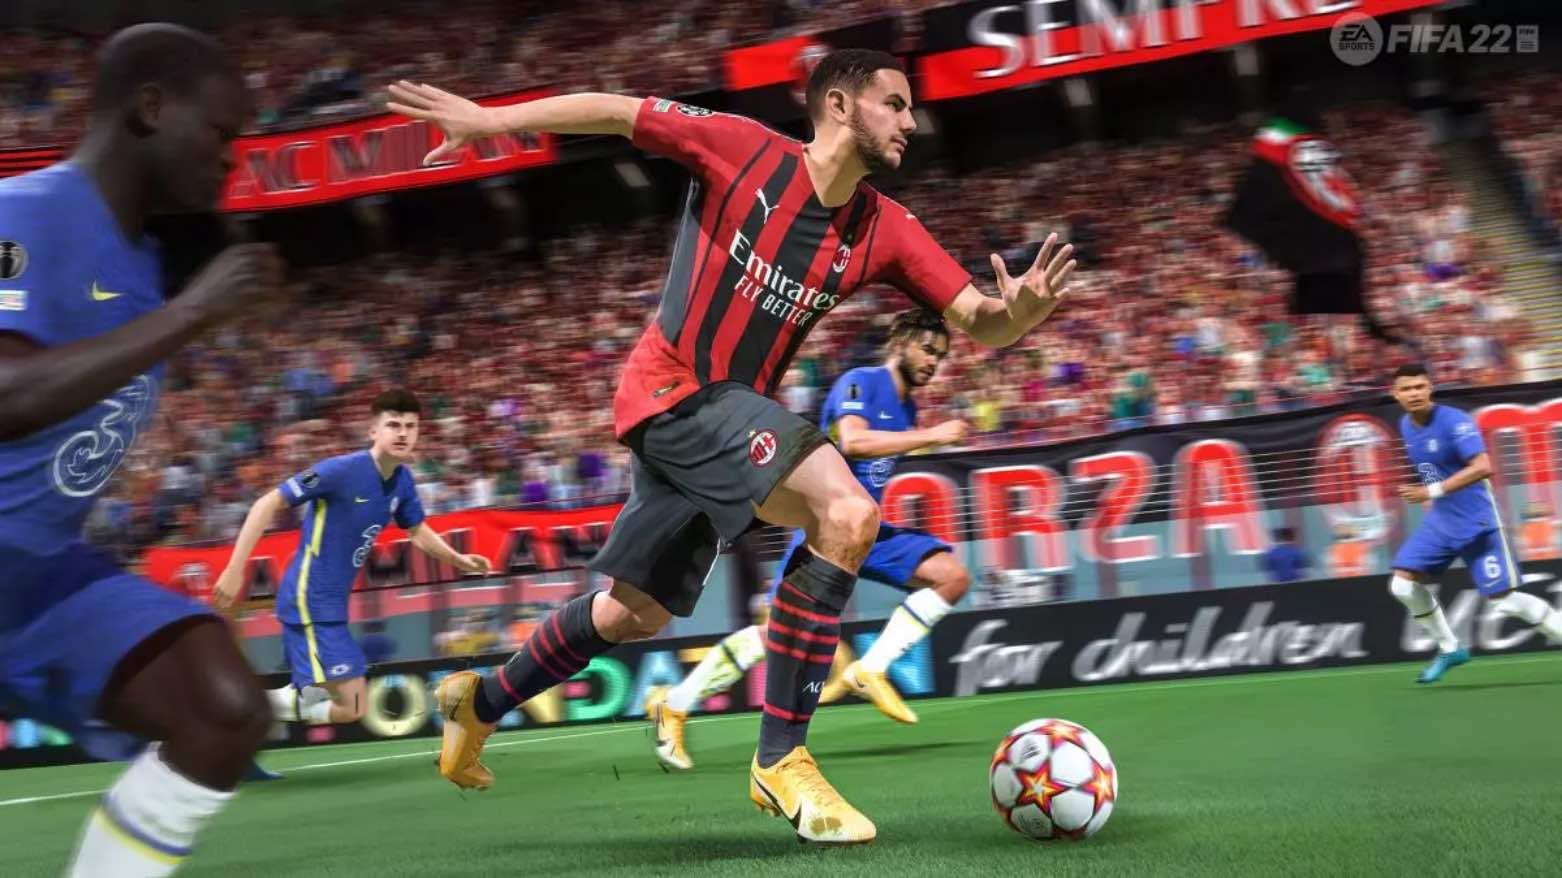 FIFA 22 gameplay trailer